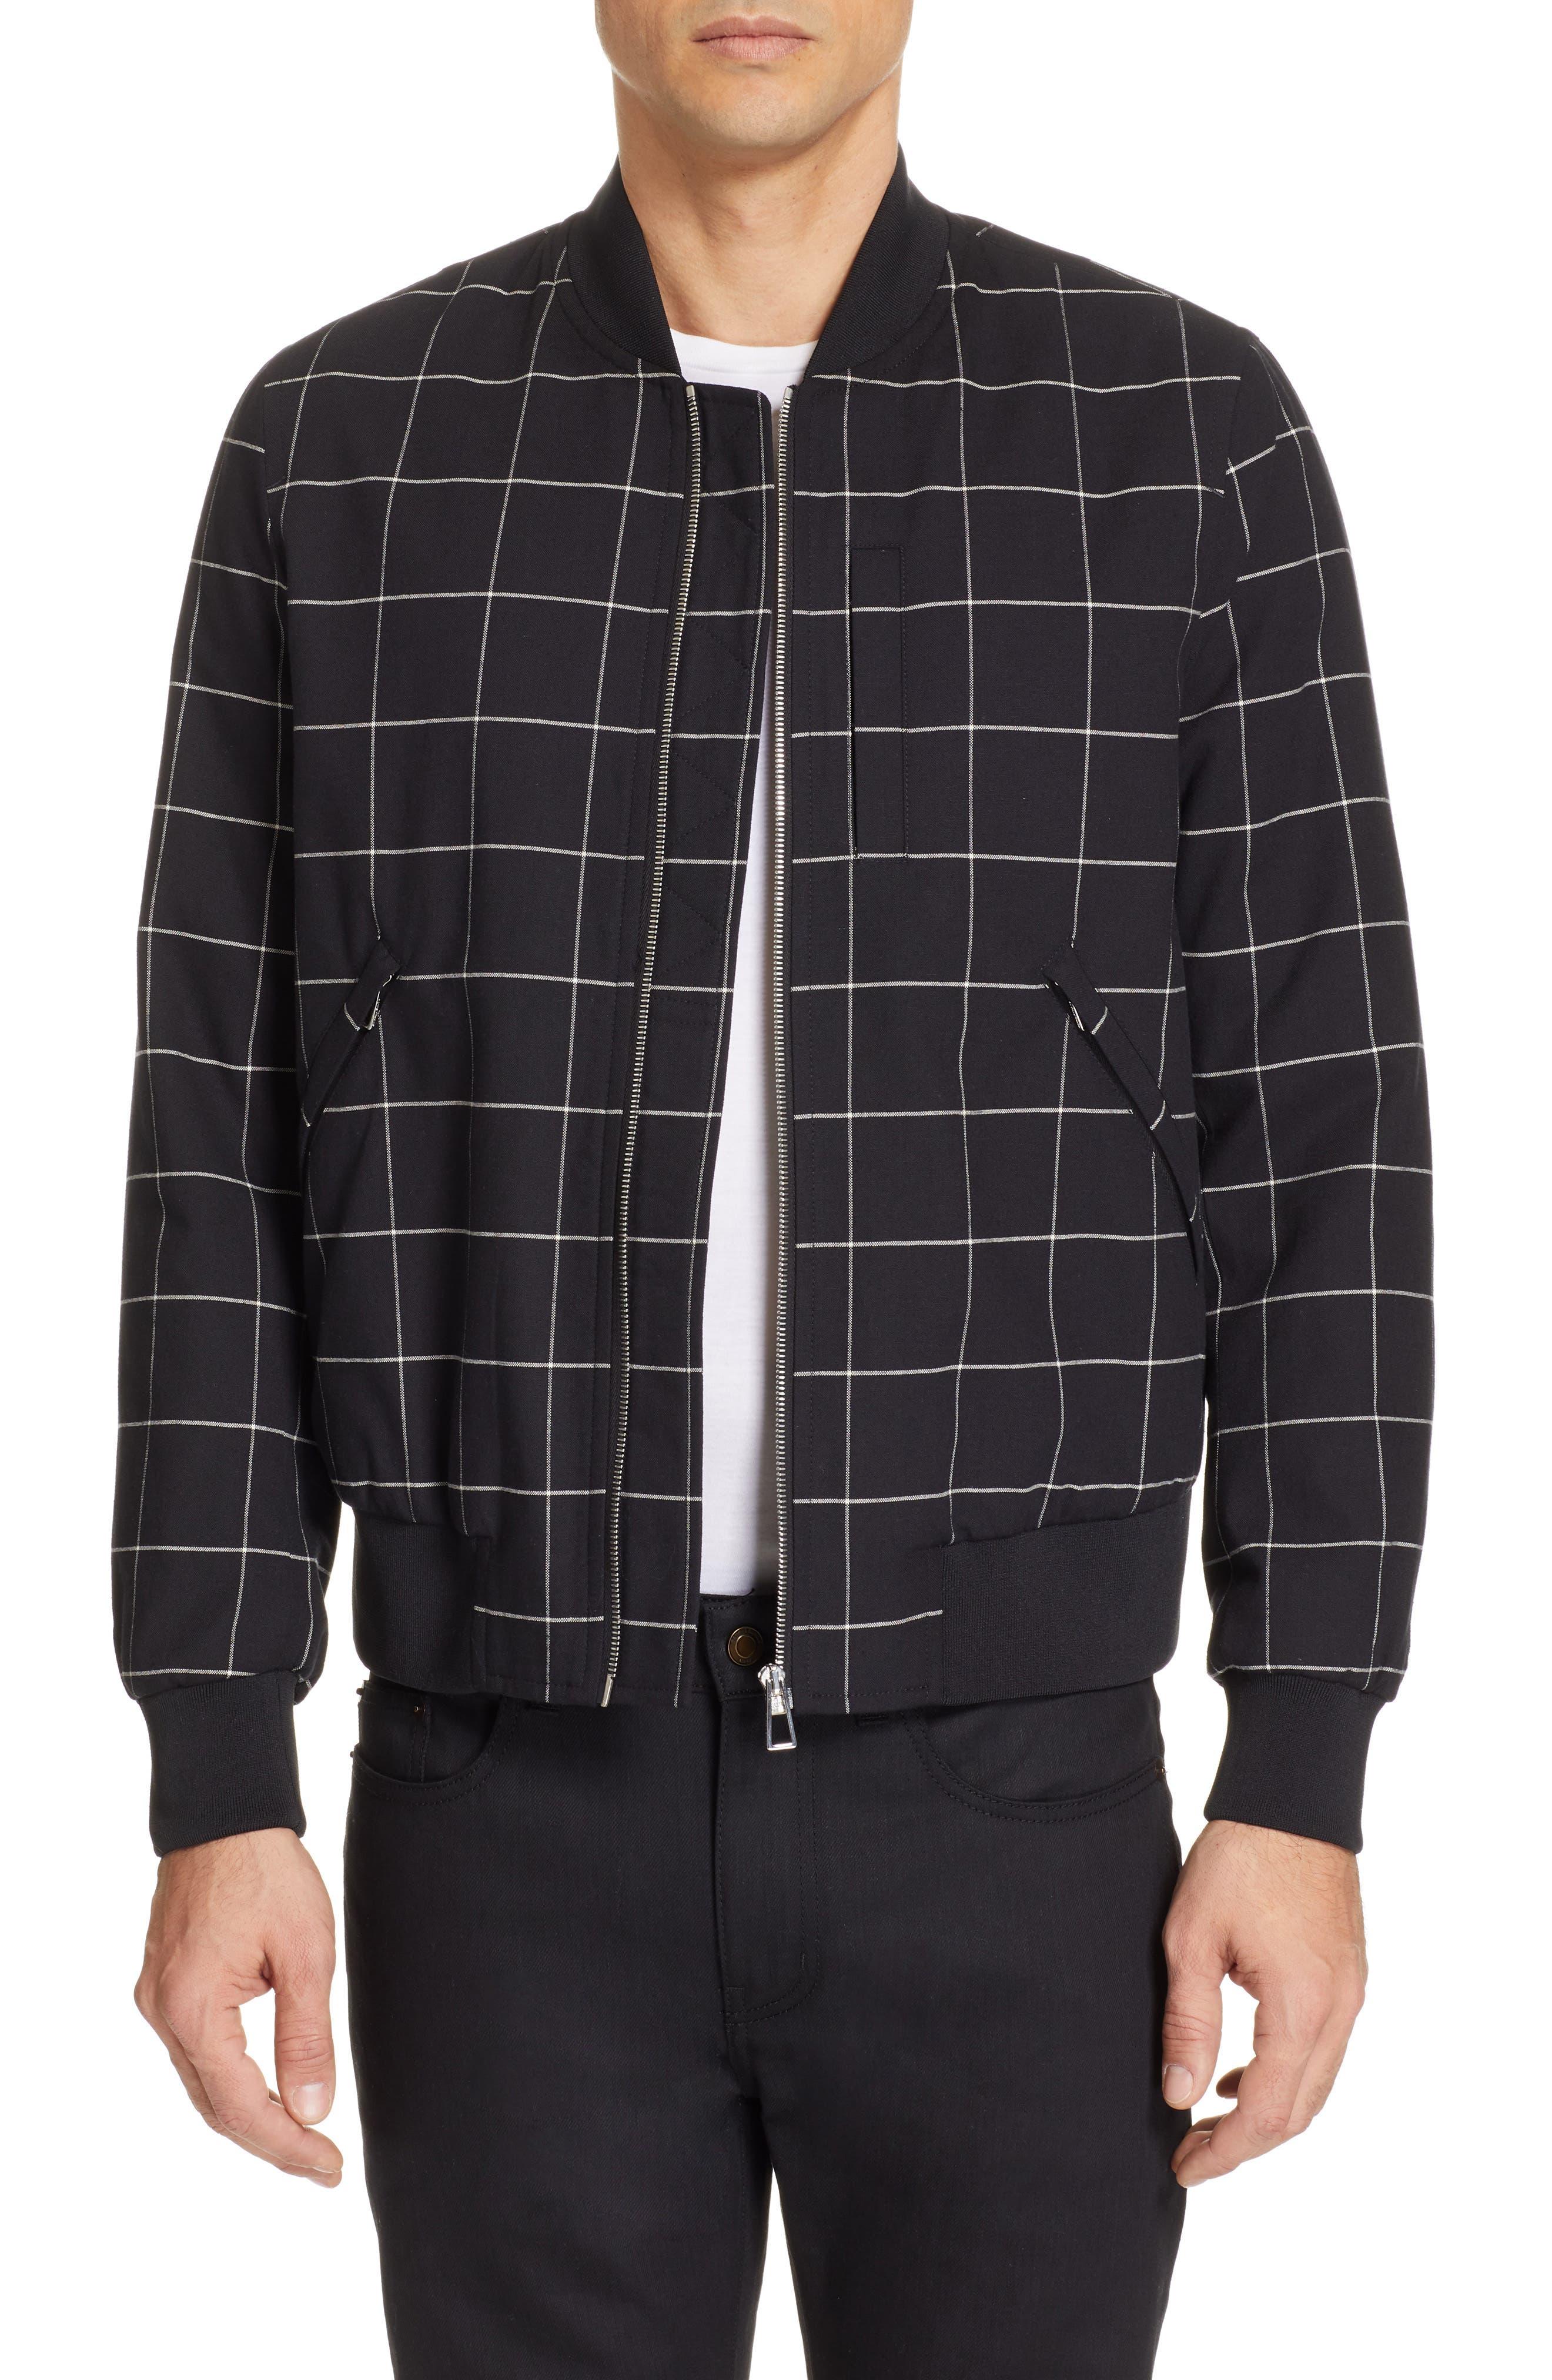 PS PAUL SMITH, Grid Wool Blend Bomber Jacket, Main thumbnail 1, color, BLACK